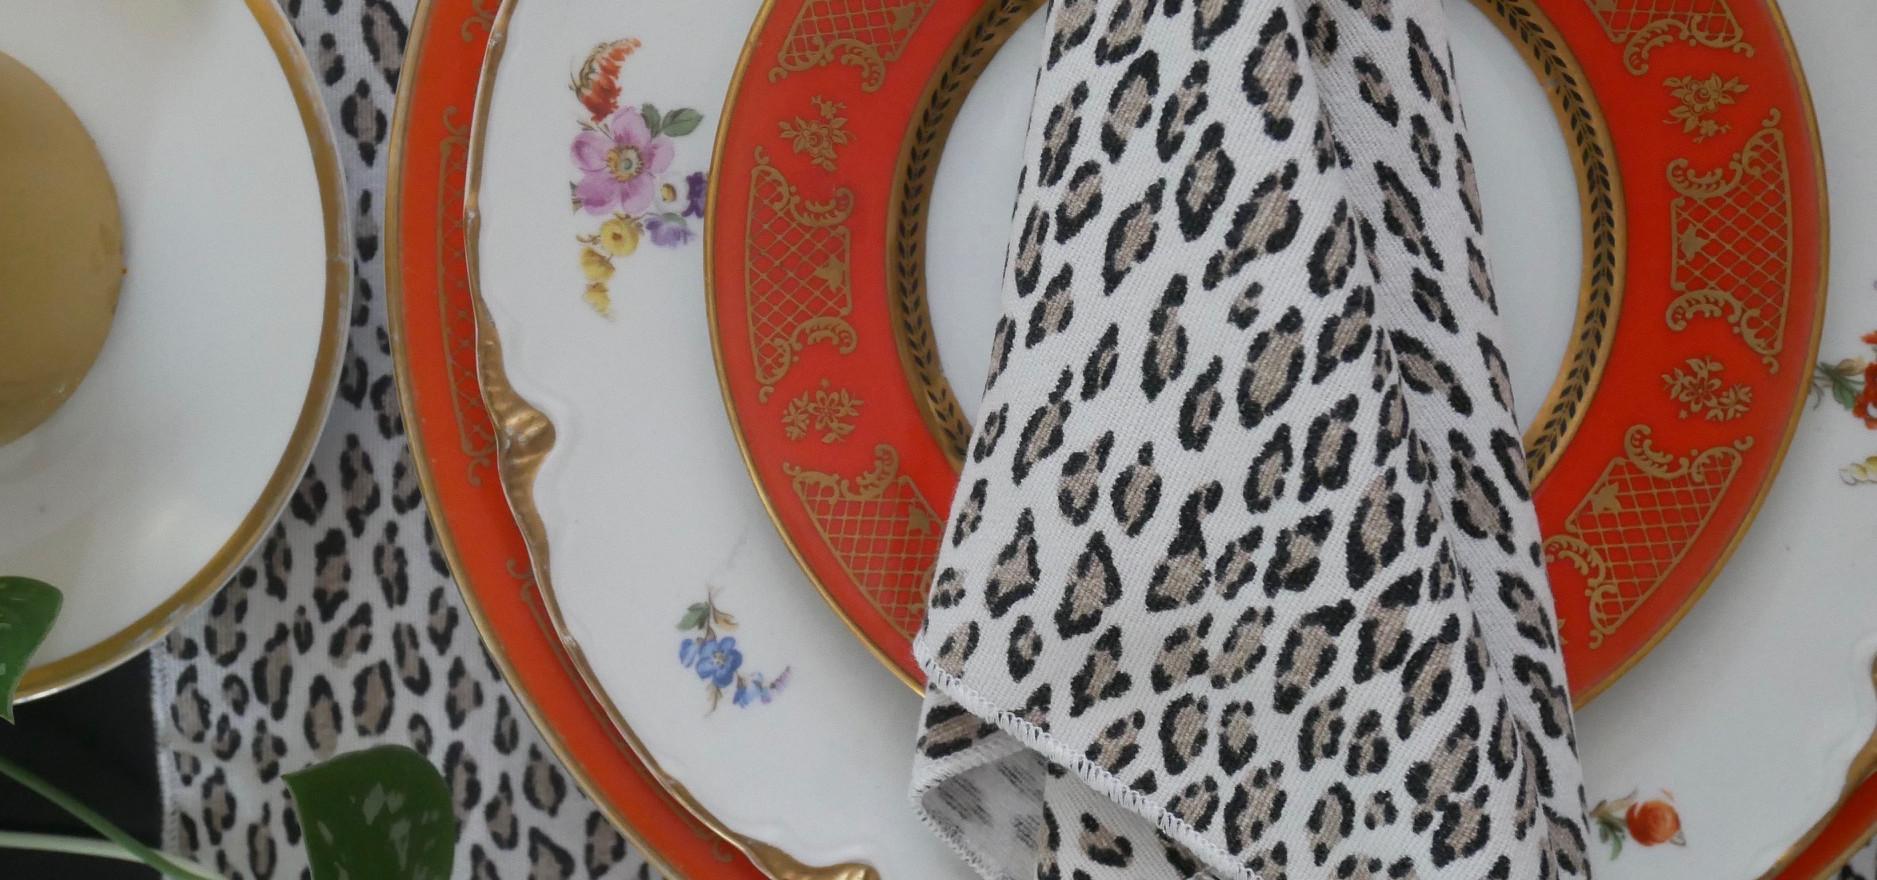 Repuposed Fabric Home Goods